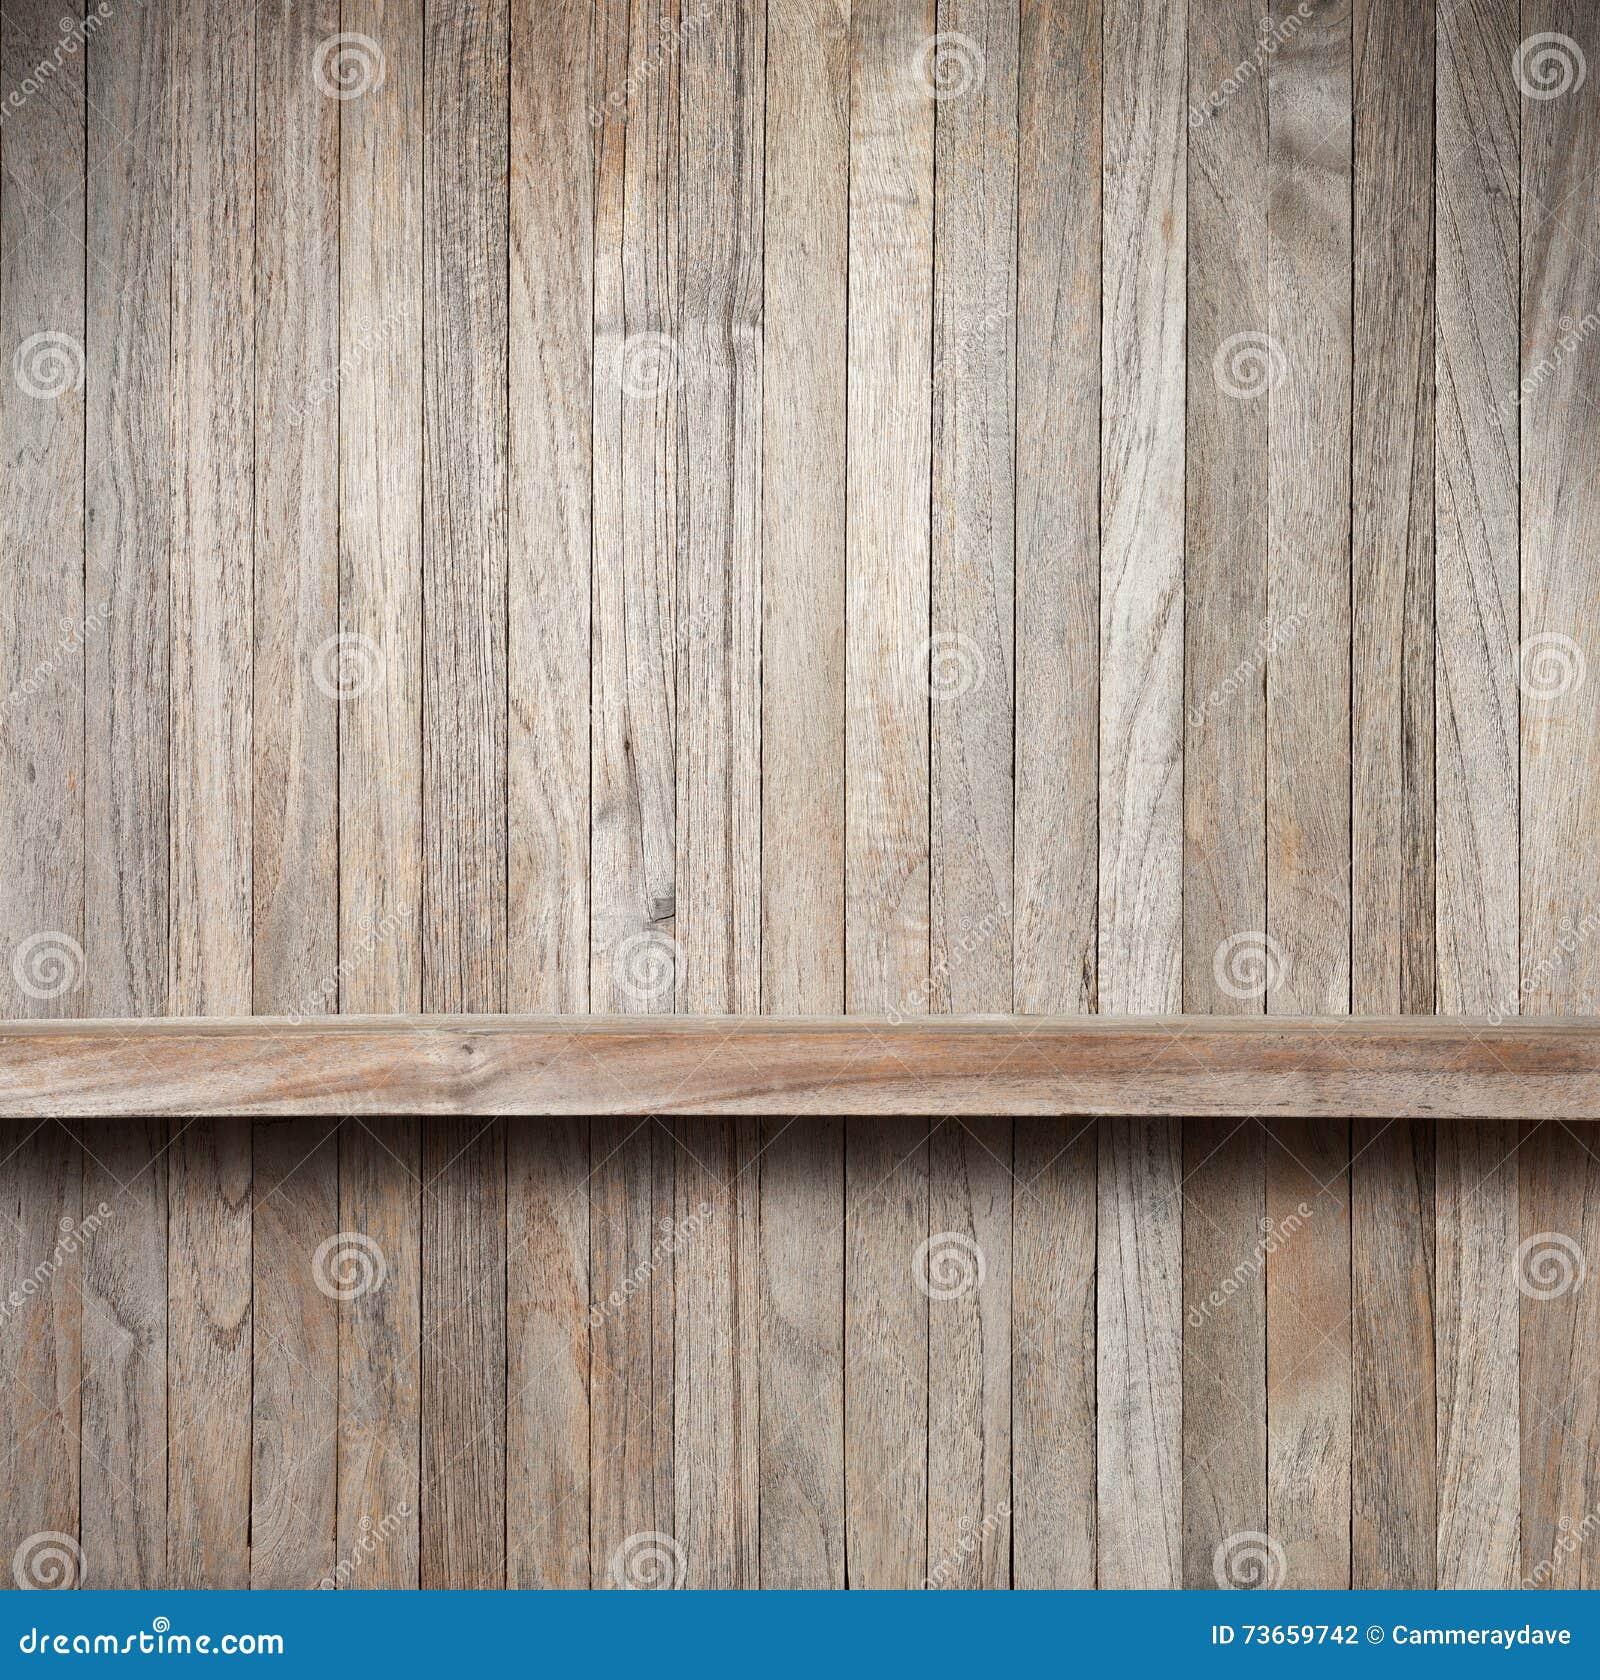 Rustic Wood Shelf Background